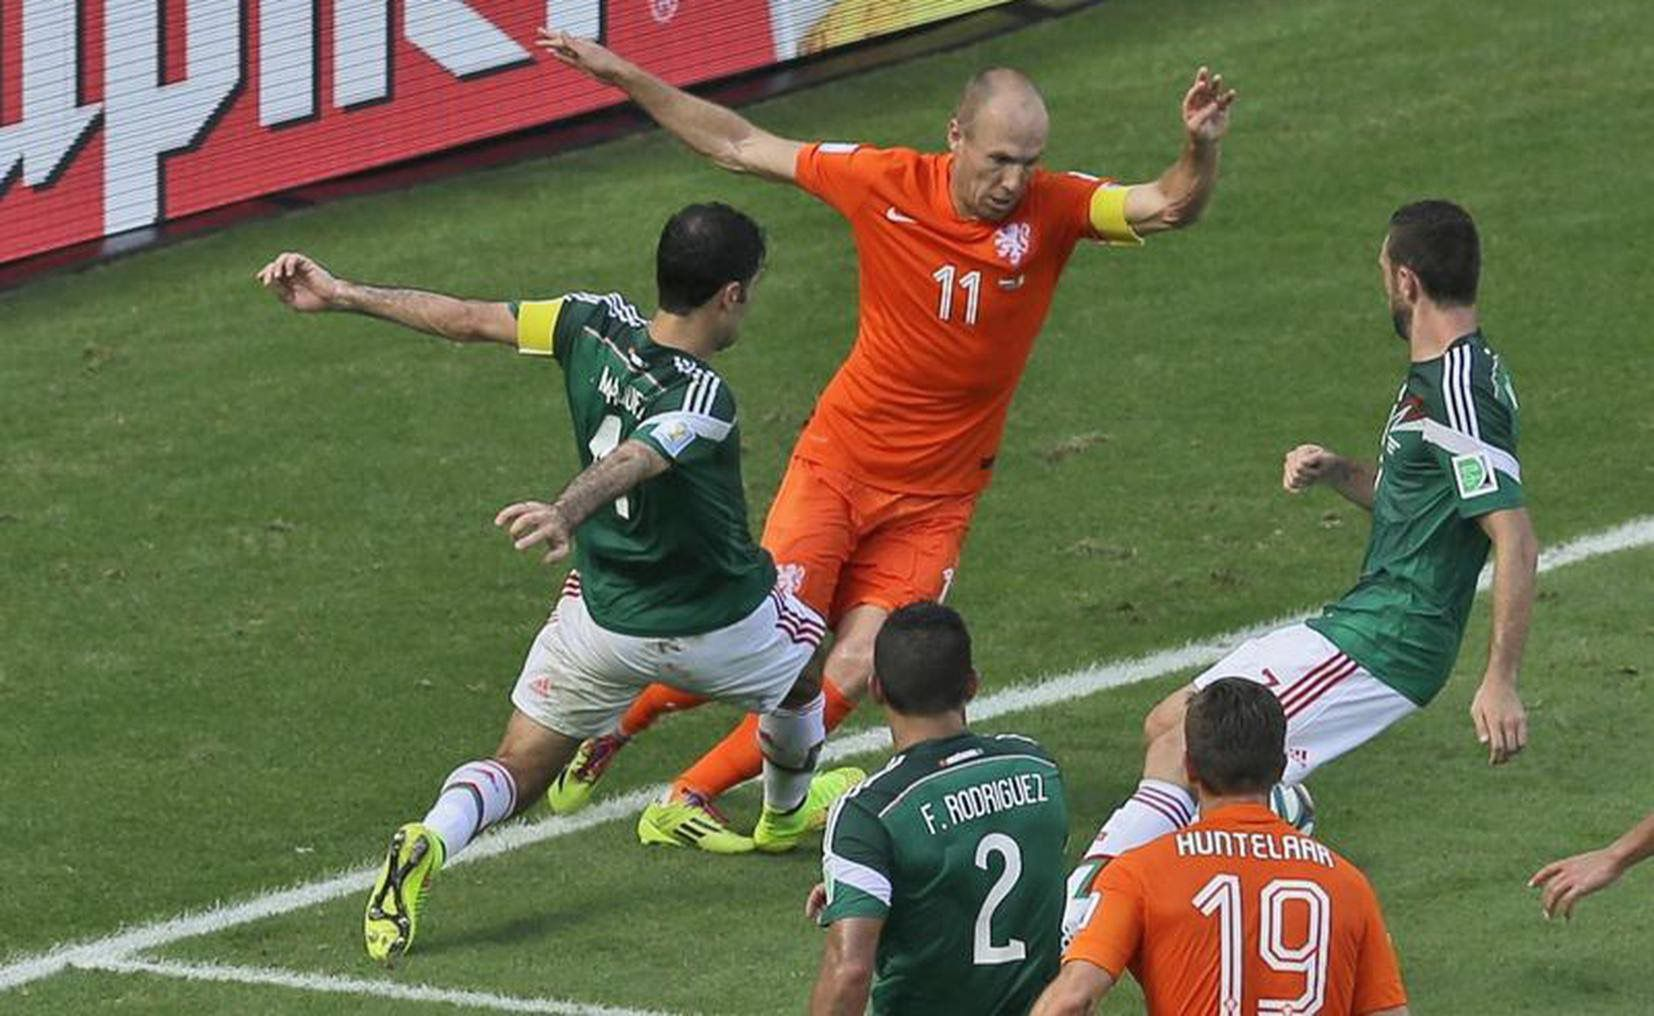 México vs Holanda 2014 (Foto: Twitter@PabloCarrilloL)